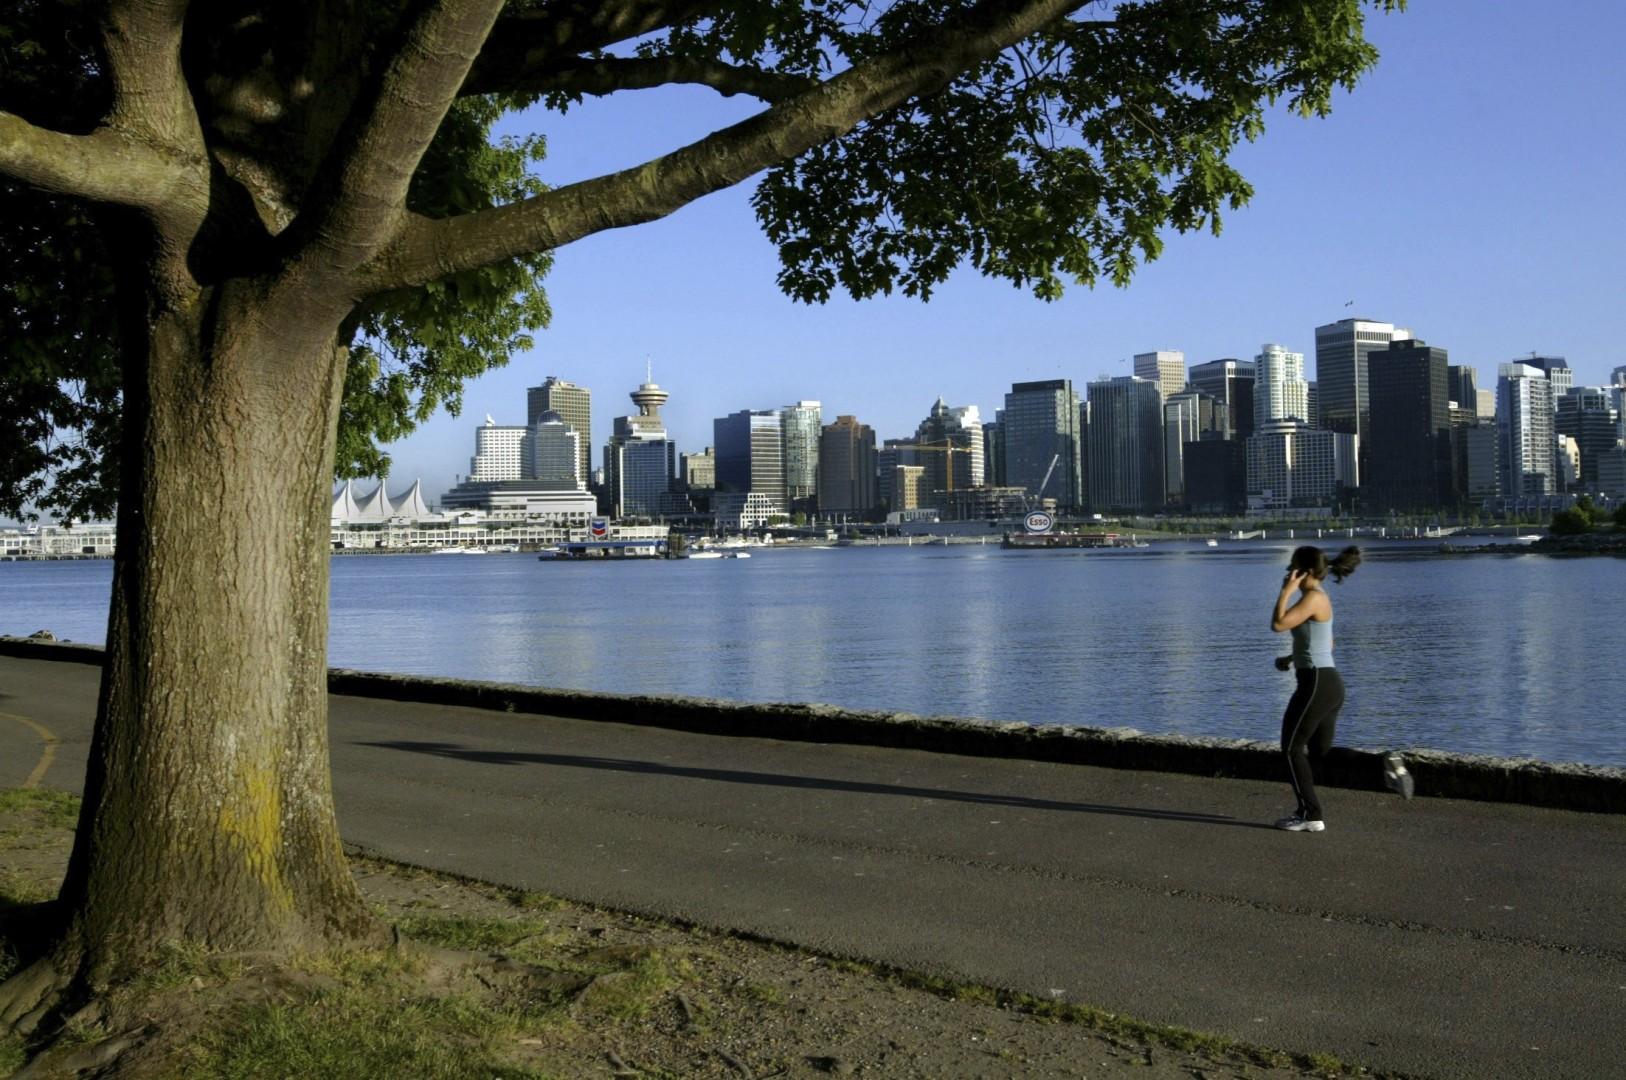 b48b833eb8292 Hong Kong man who brought Filipino maid to Canada jailed for 18 months    South China Morning Post